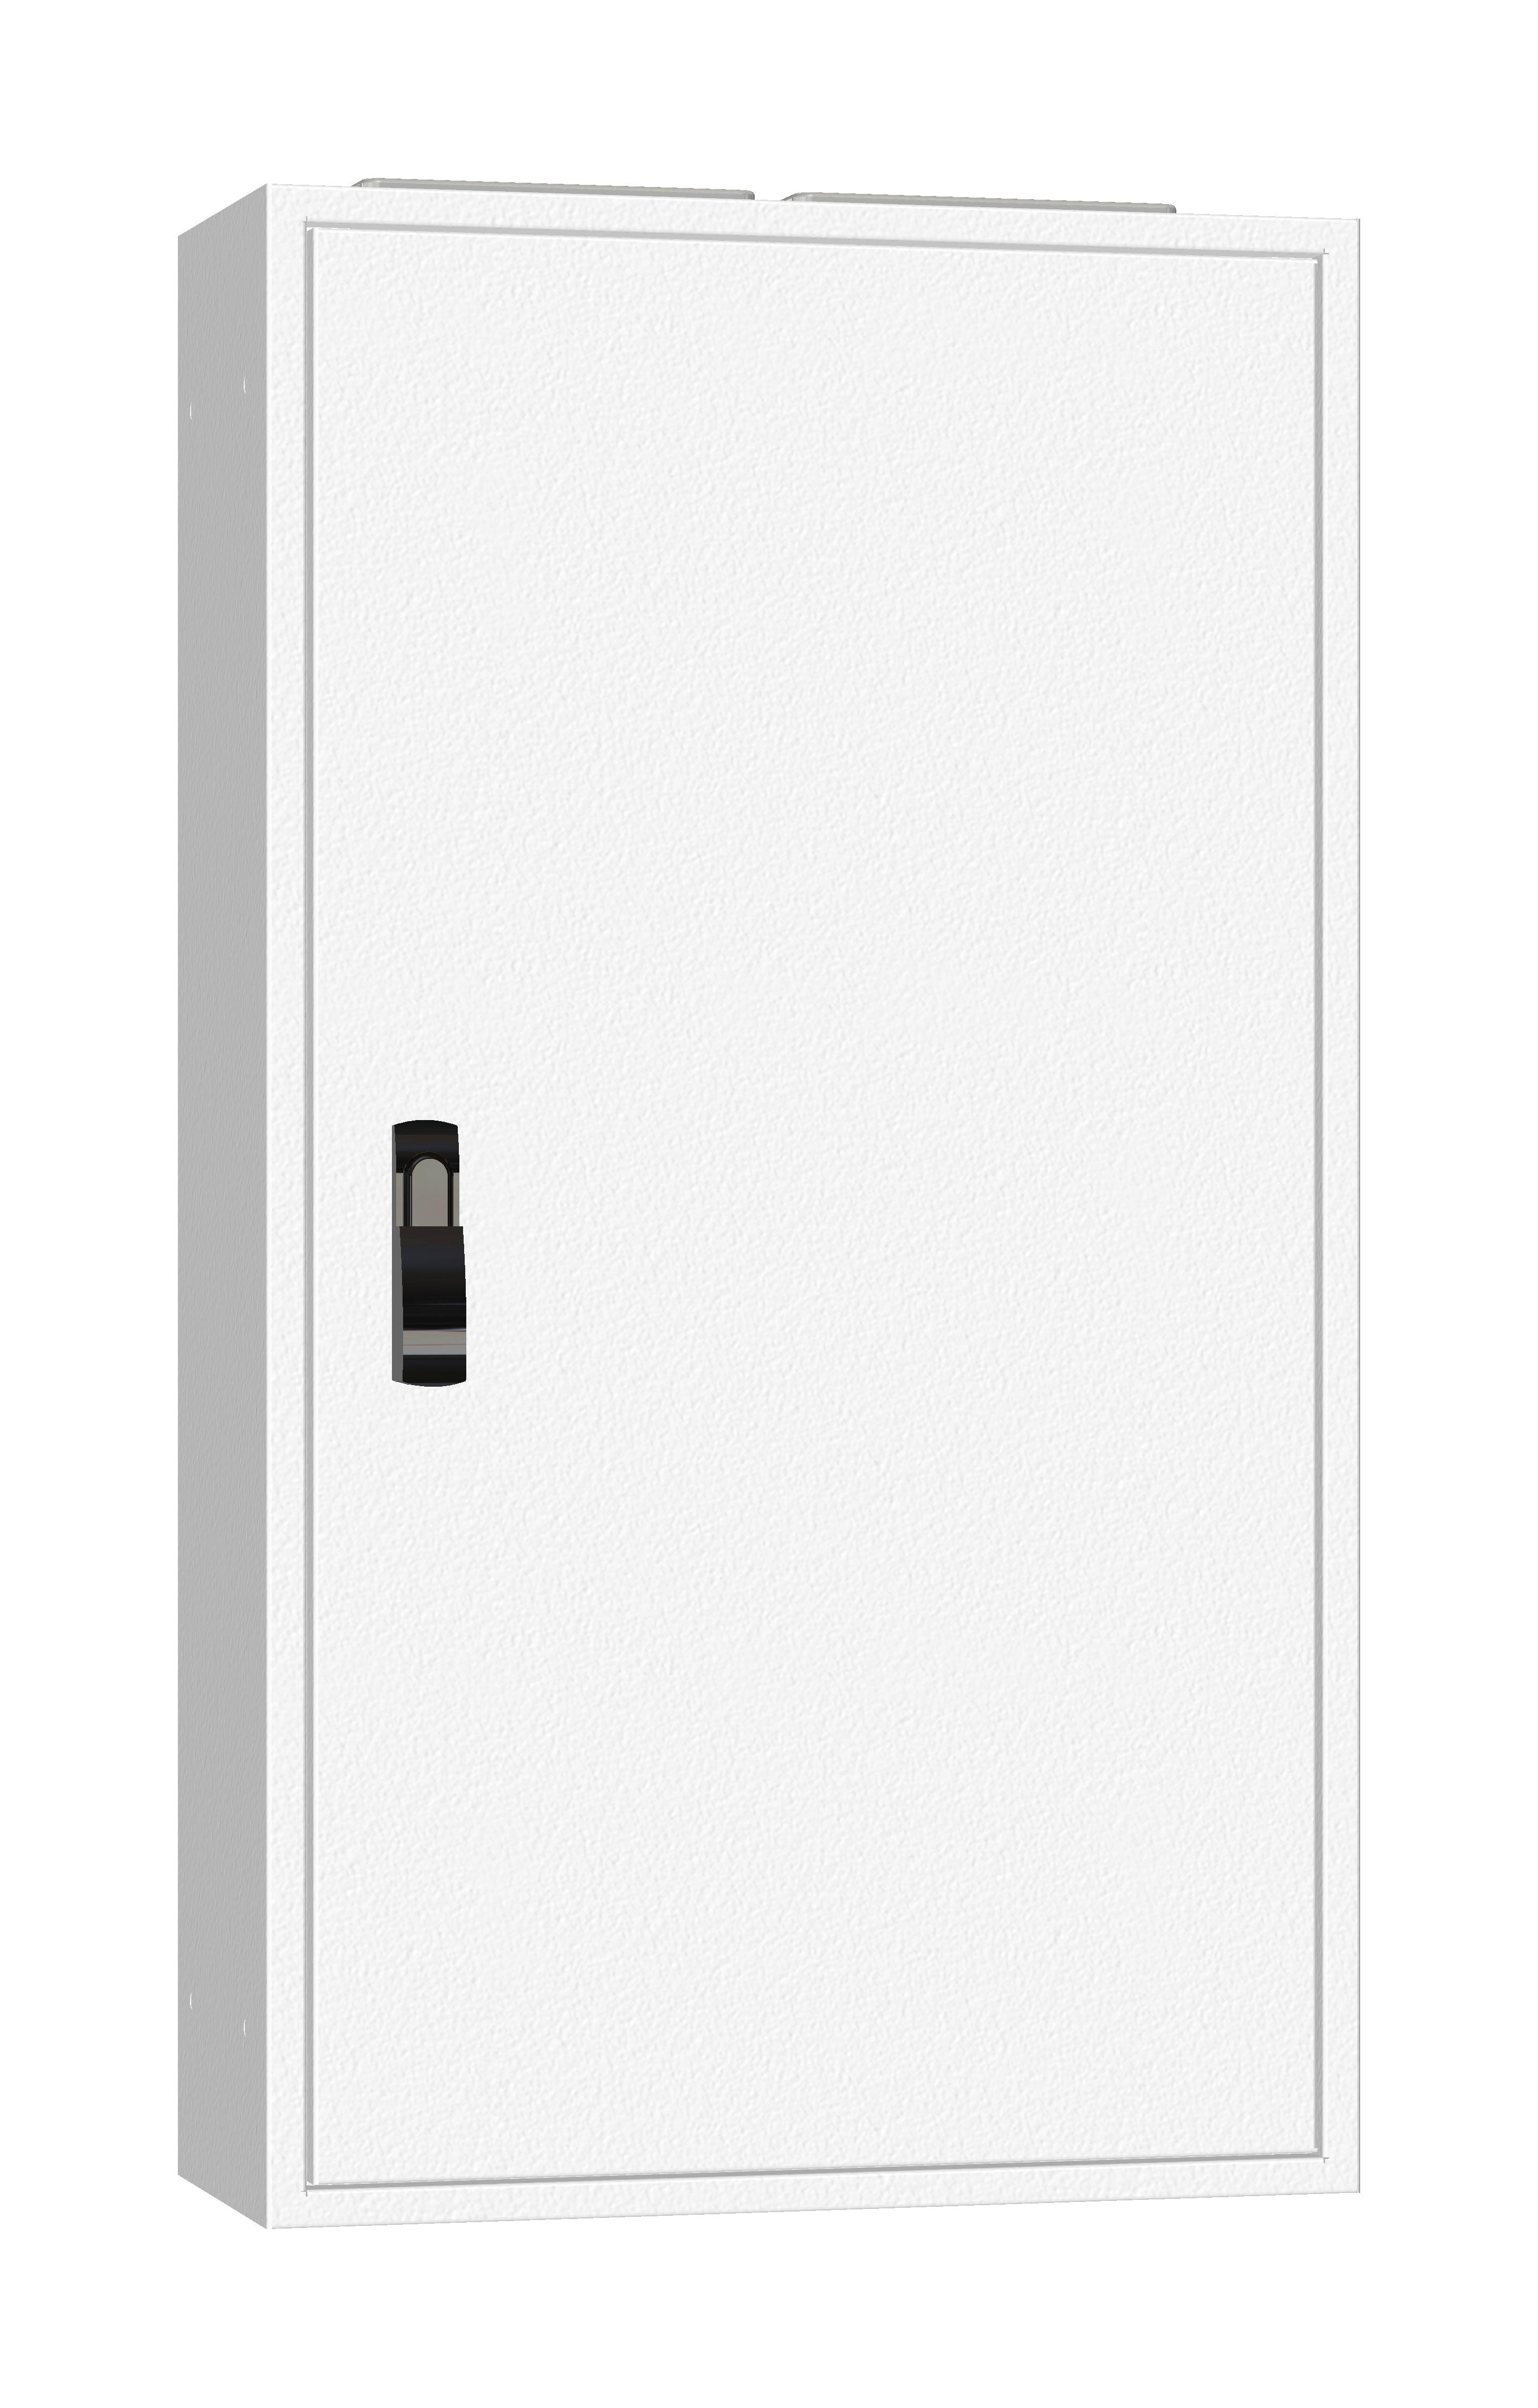 1 Stk AP-Rahmen + Tür 2A-21 T=250mm, Rückwand + Schwenkhebel, IP54 IL952221--